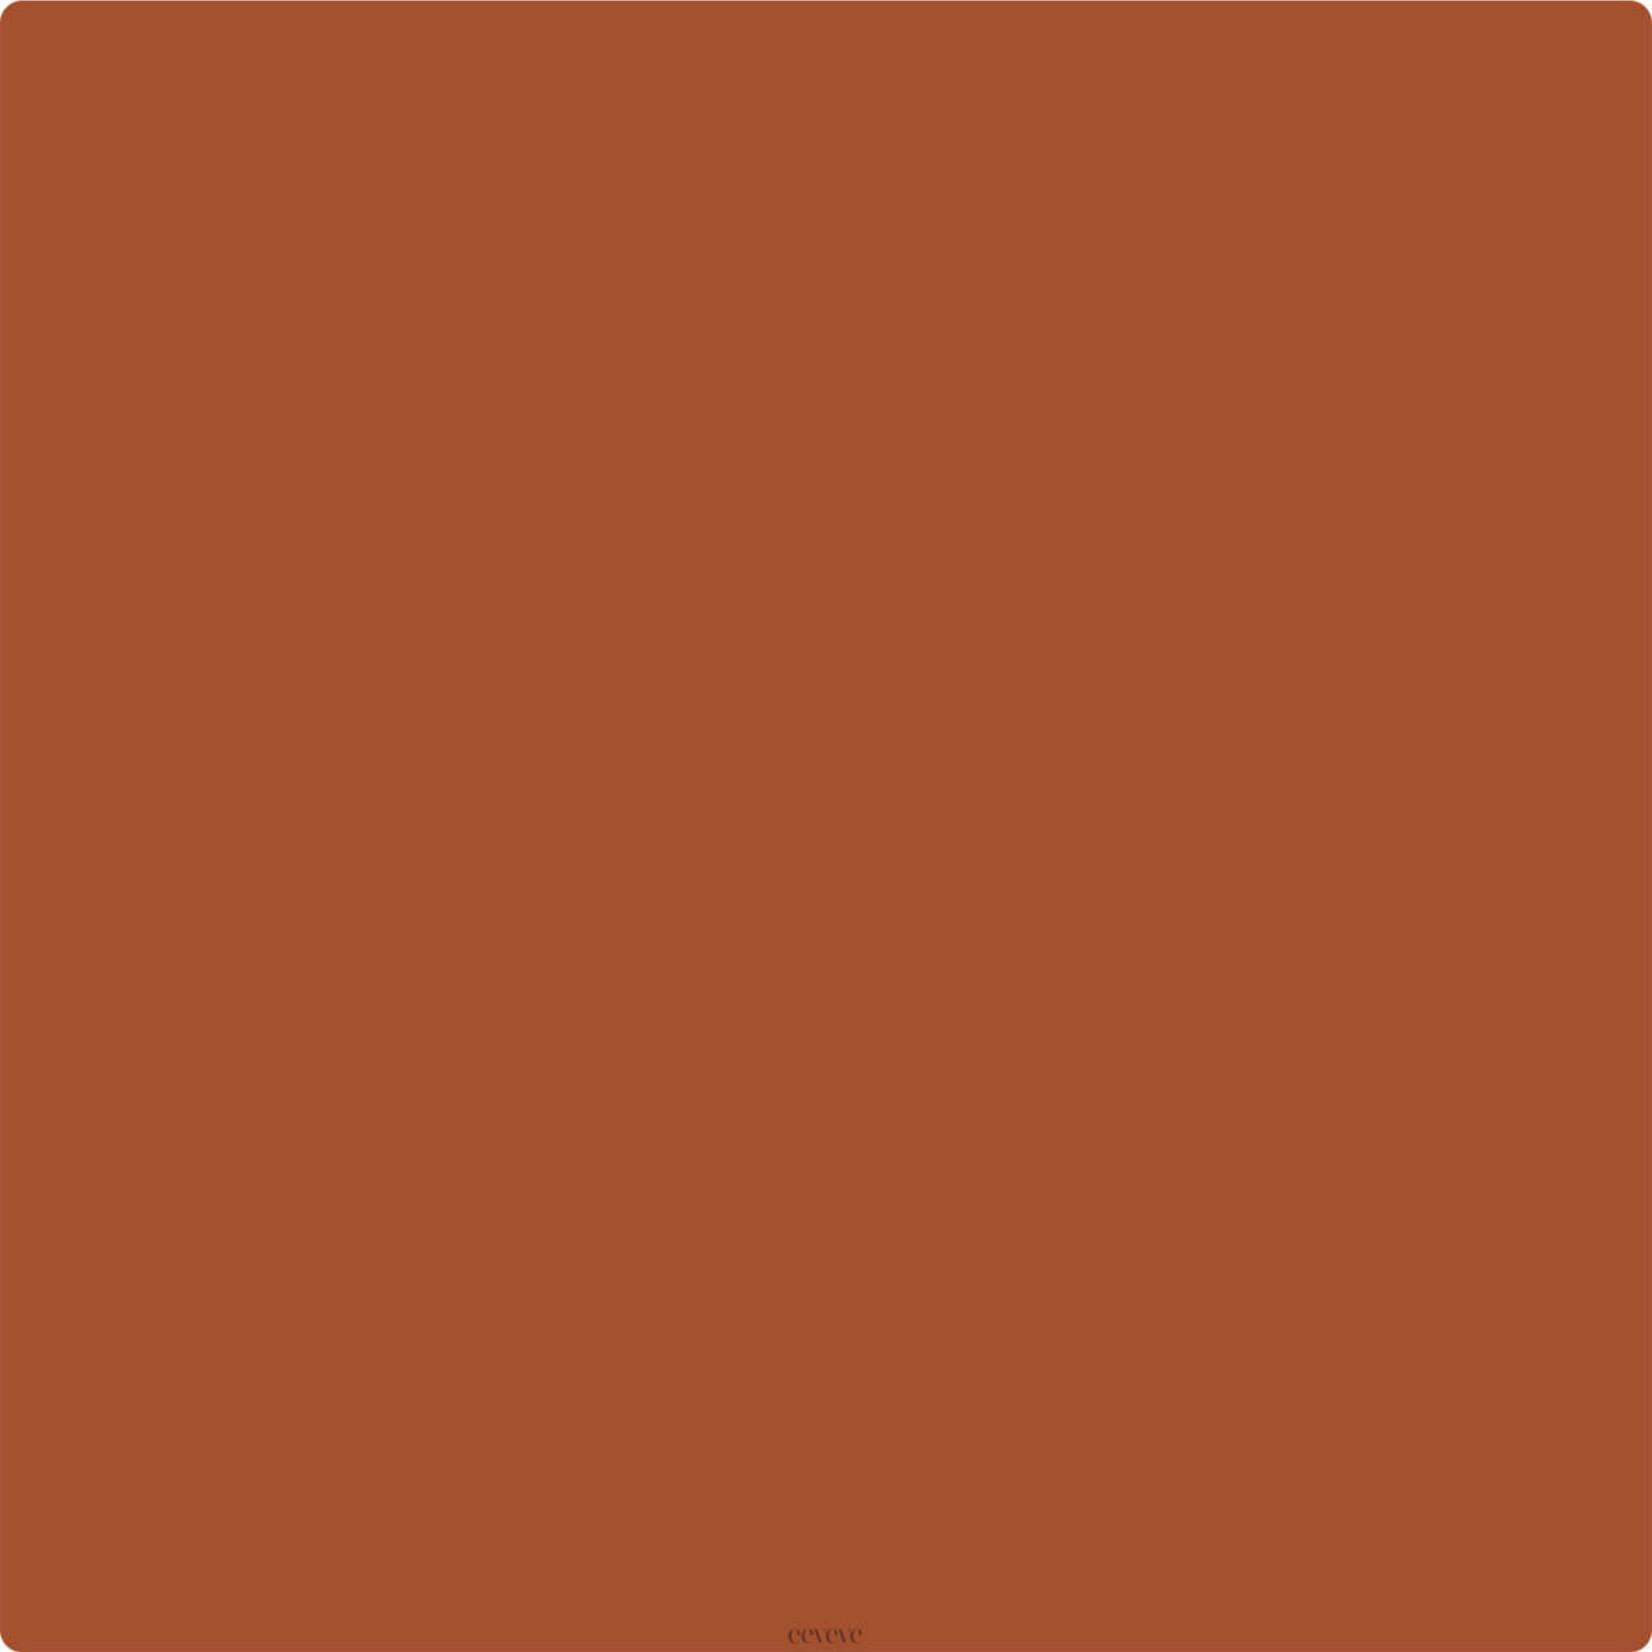 Eeveve Eeveve Square Splash Mat Rust